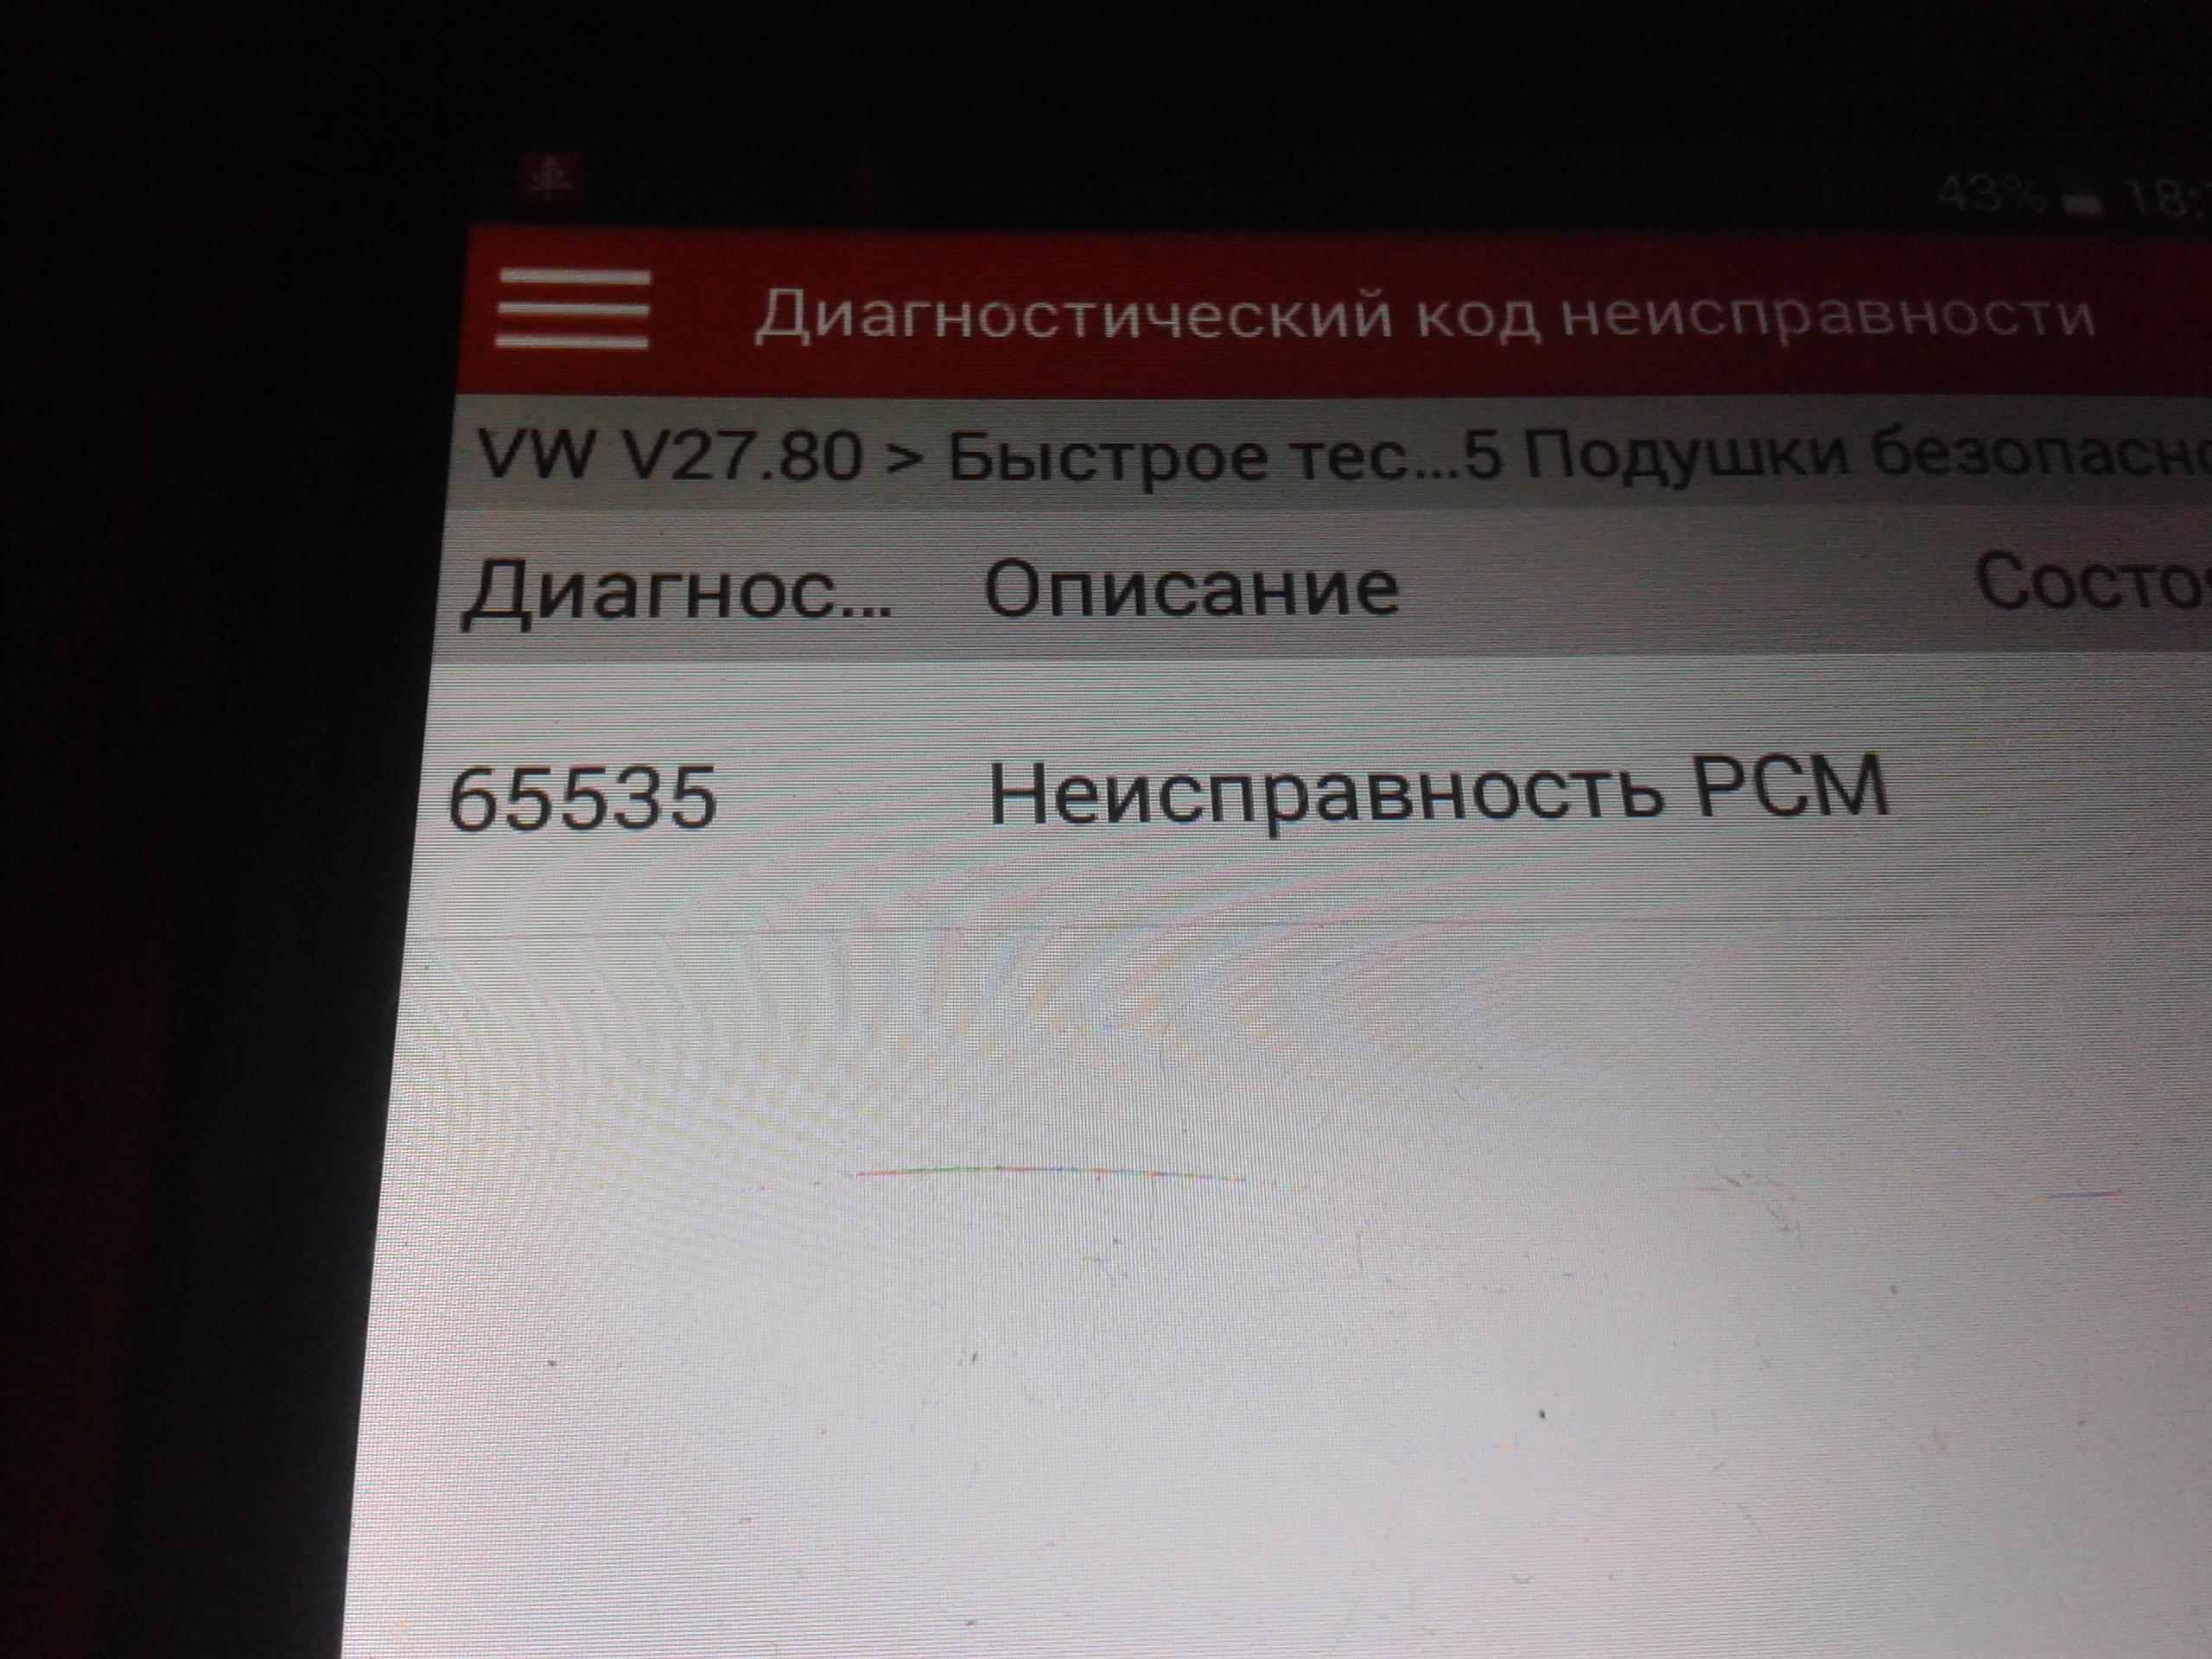 http://ipic.su/img/img7/fs/20180514_181406.1526316574.jpg